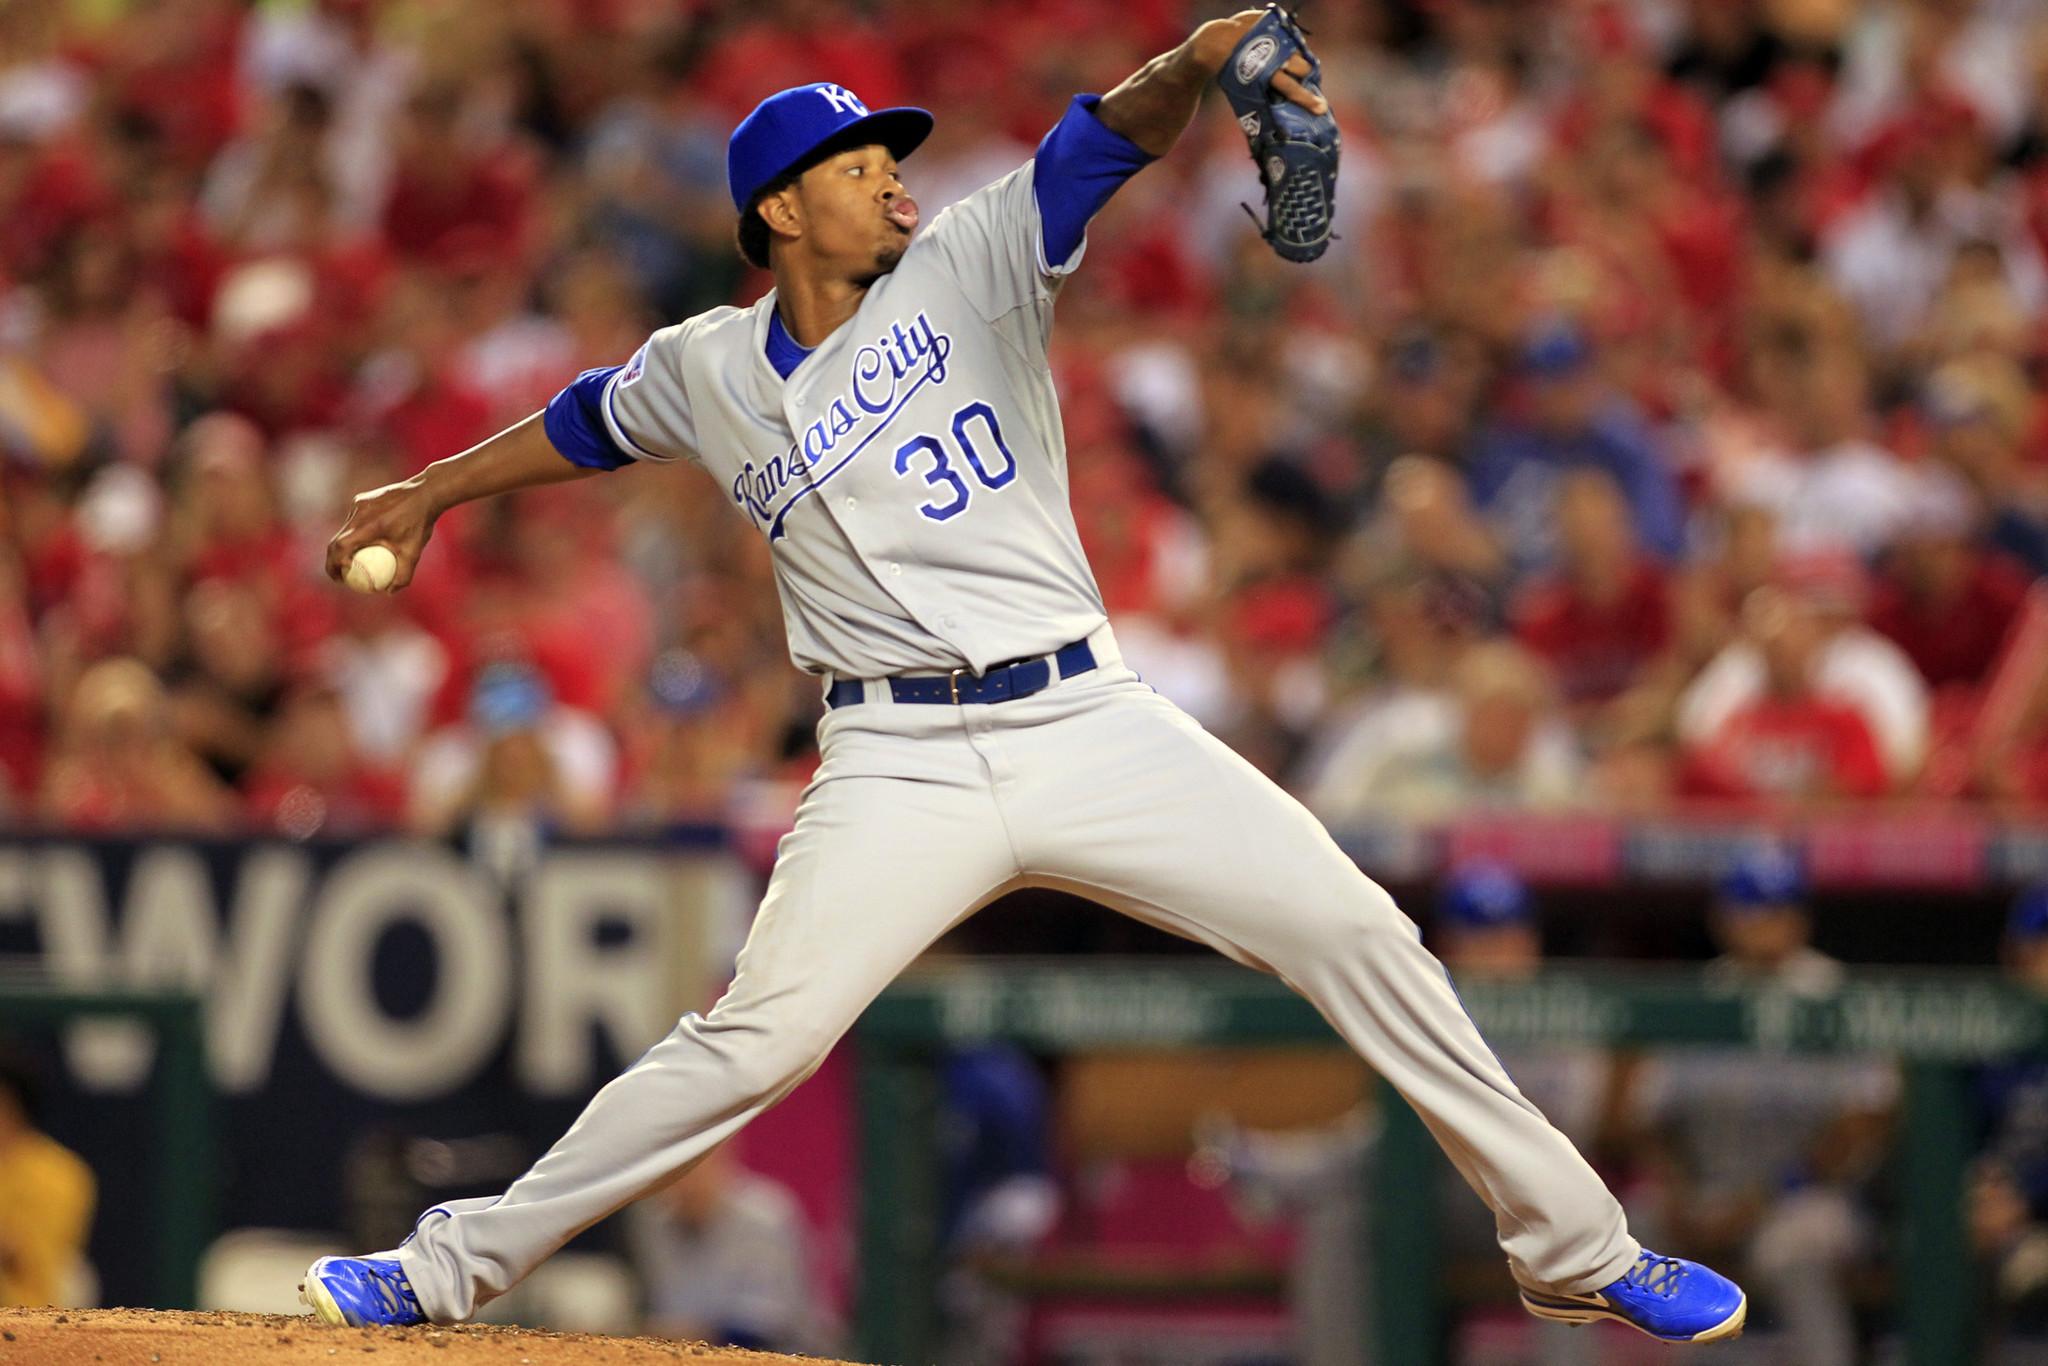 La-sp-dominican-republic-baseball-deaths-20170122